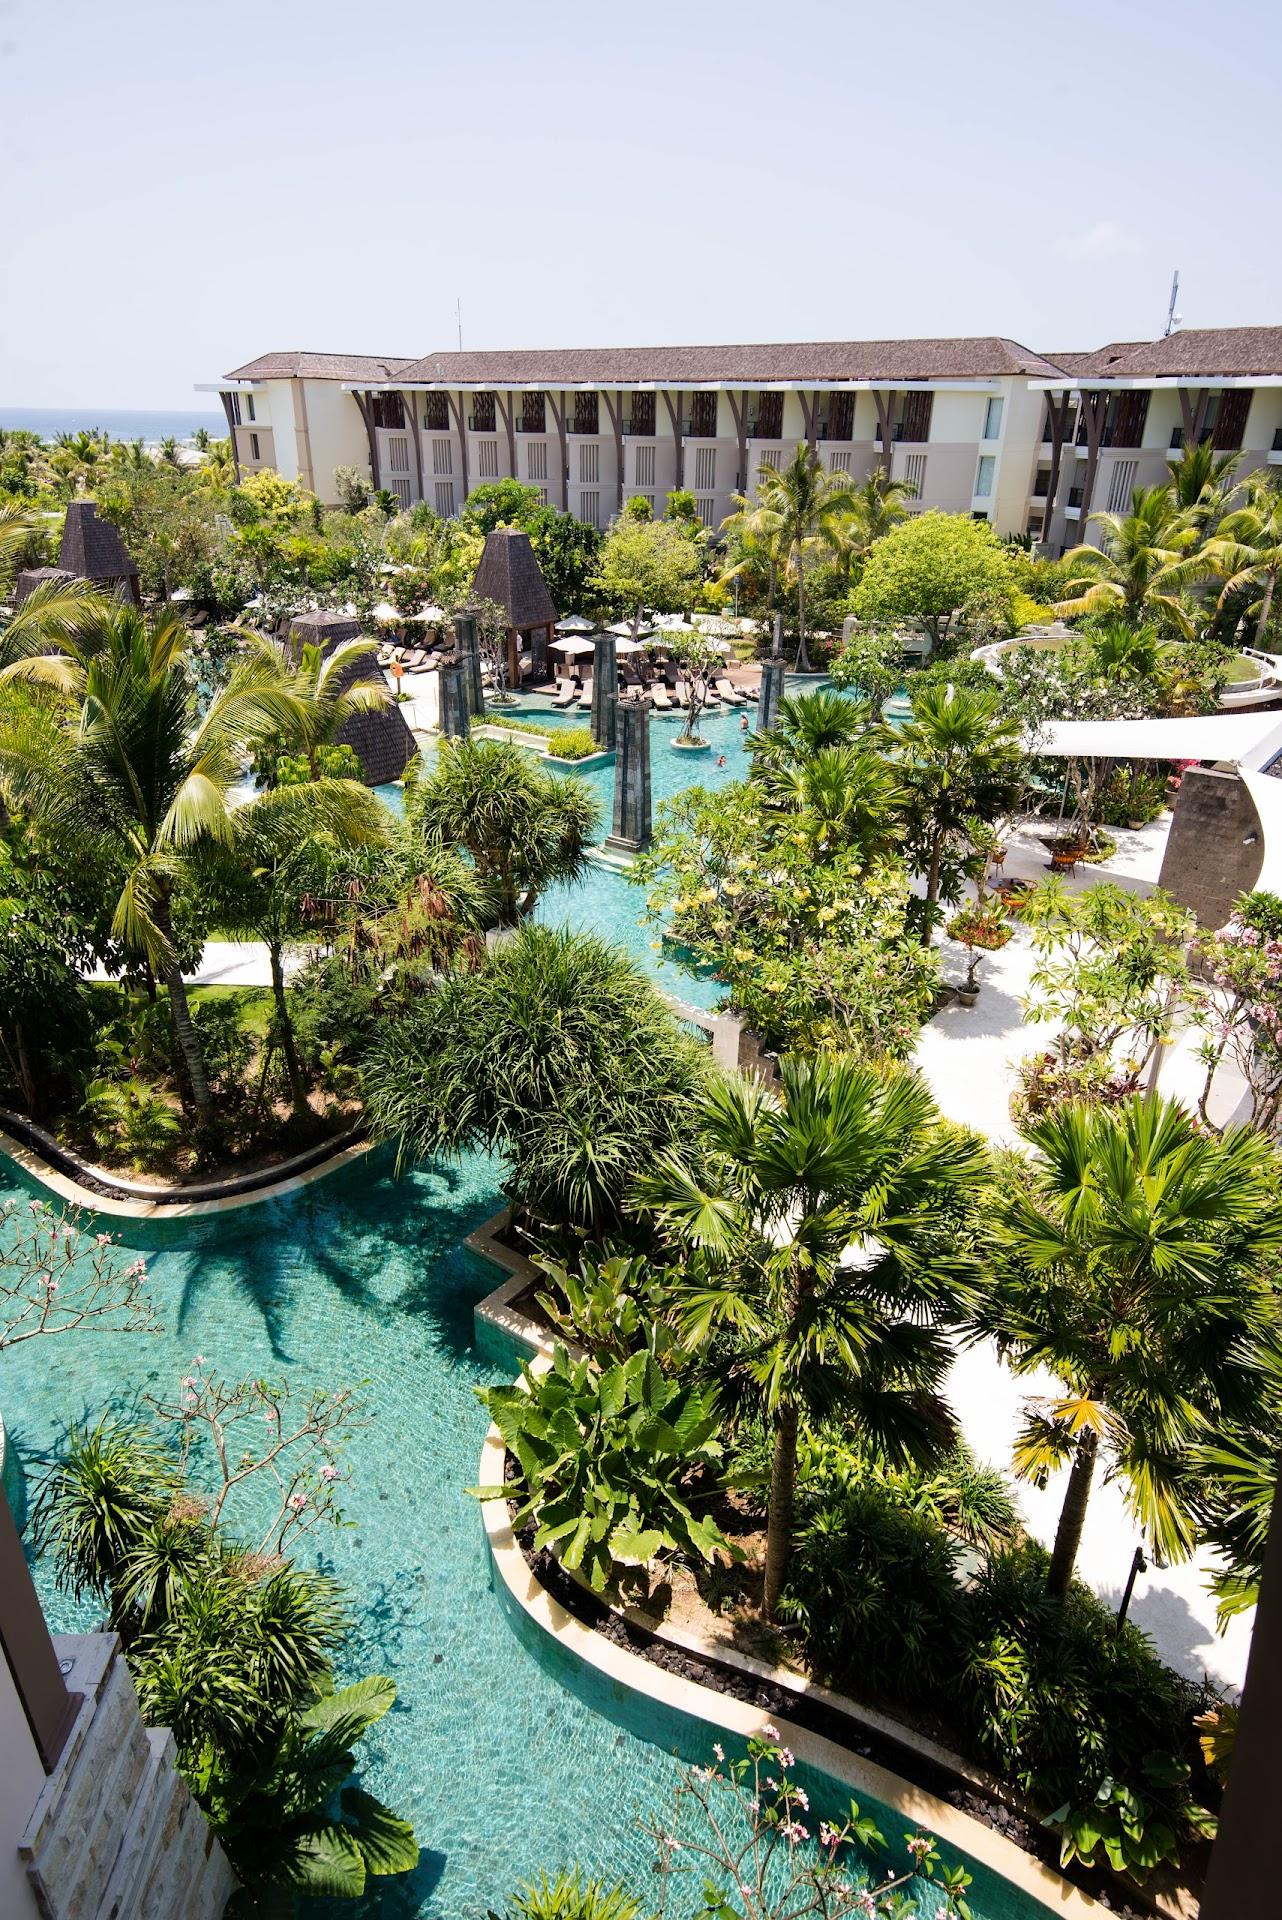 best pools in the world, best hotels in bali, honeymoon resort, bali nusa dua, travel blog, couple travel bloggers, asian korean blogger, japanese, california san francisco bay area travel blogger